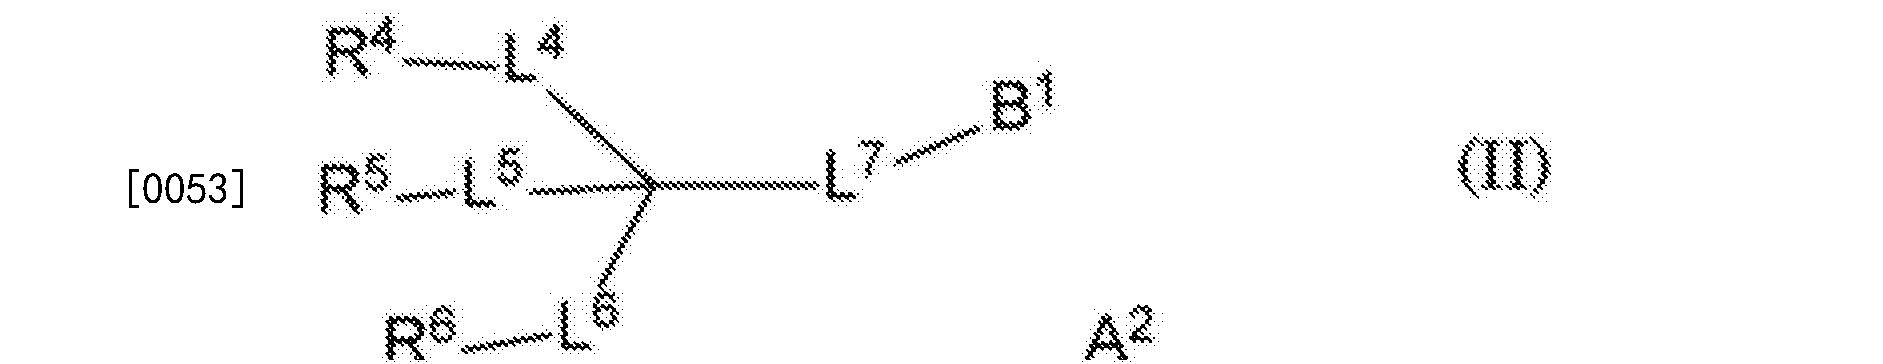 Figure CN107427531AD00441